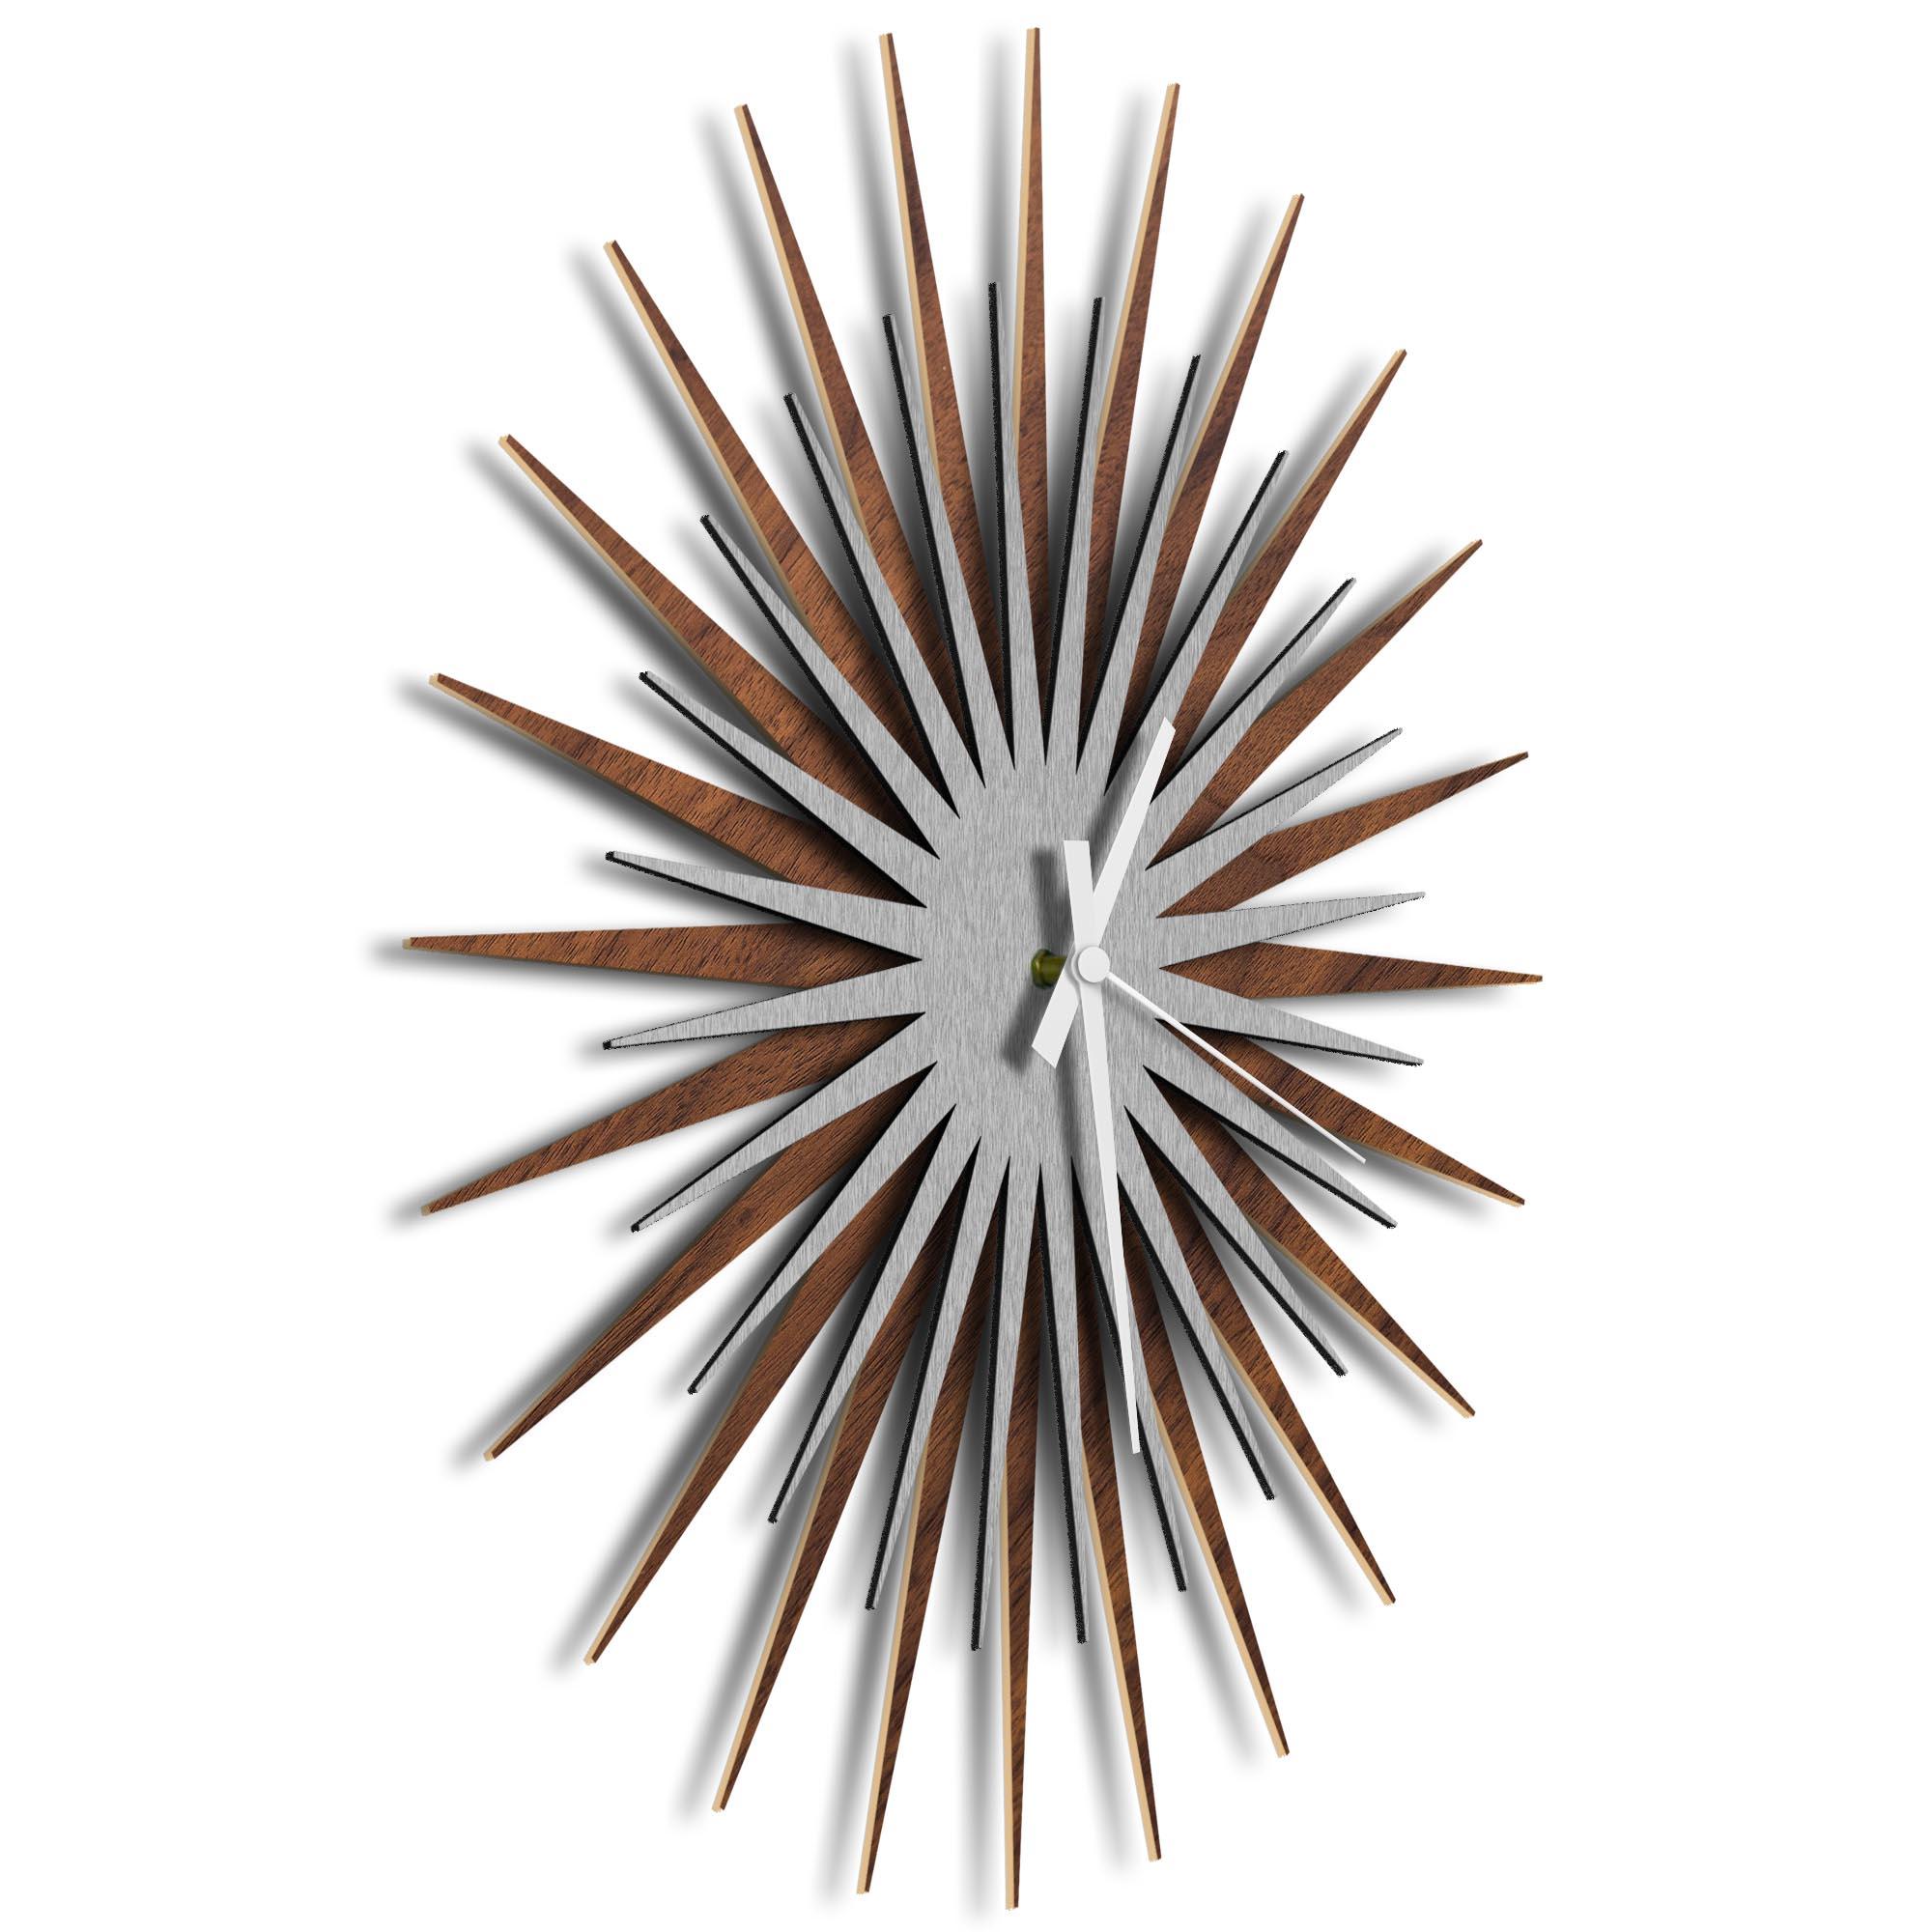 Atomic Era Clock Walnut Silver White by Adam Schwoeppe - Mid-Century Modern Clock on Brushed Walnut Polymetal - Image 2